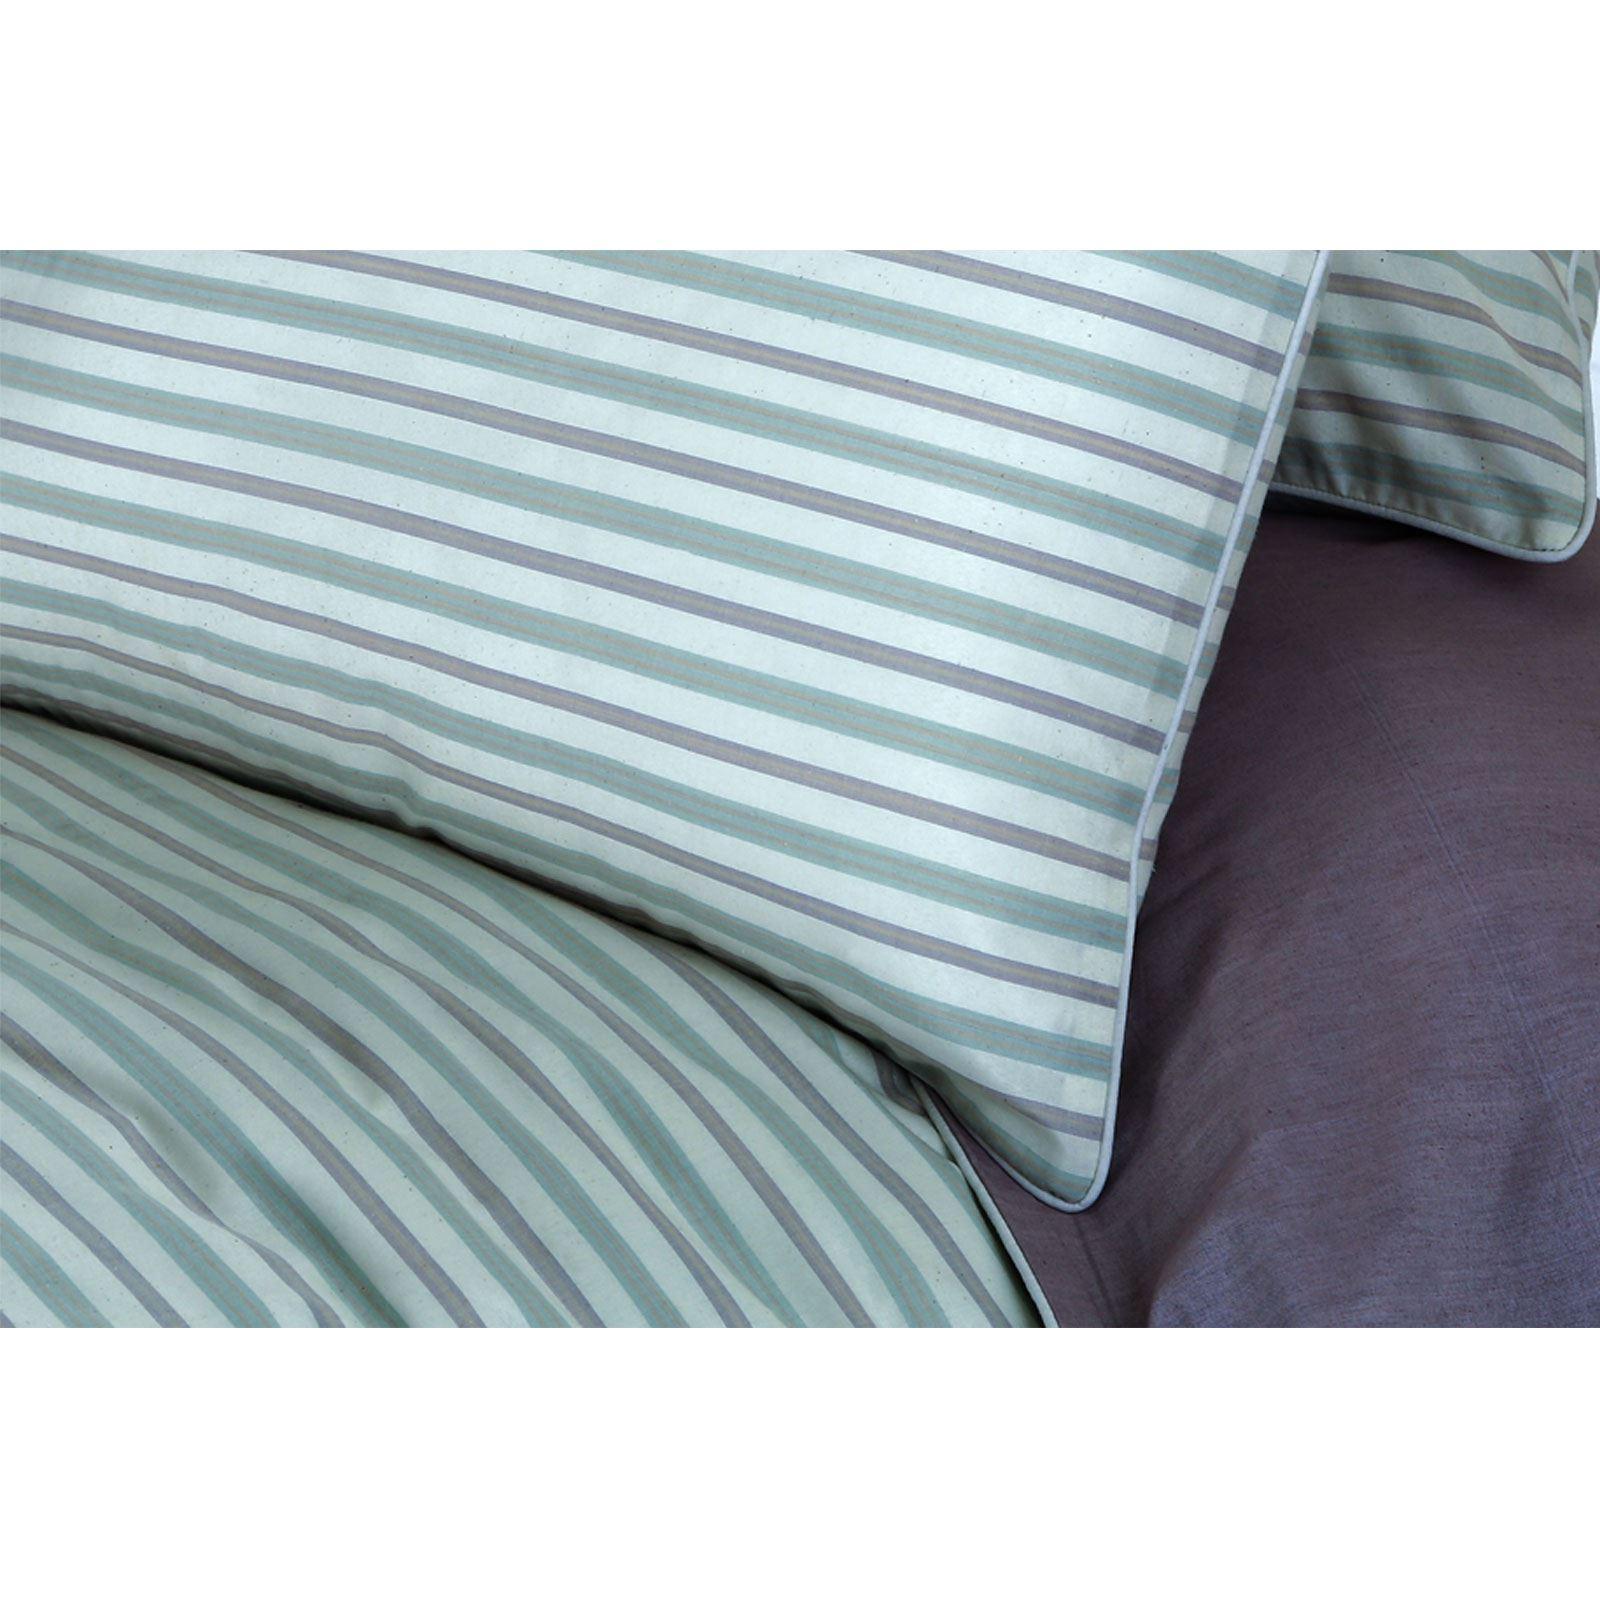 Hilo-de-algodon-de-lujo-Rico-Suave-Chambray-tenido-de-Cubierta-de-edredon-a-rayas-de-tejido-a-rayas miniatura 9